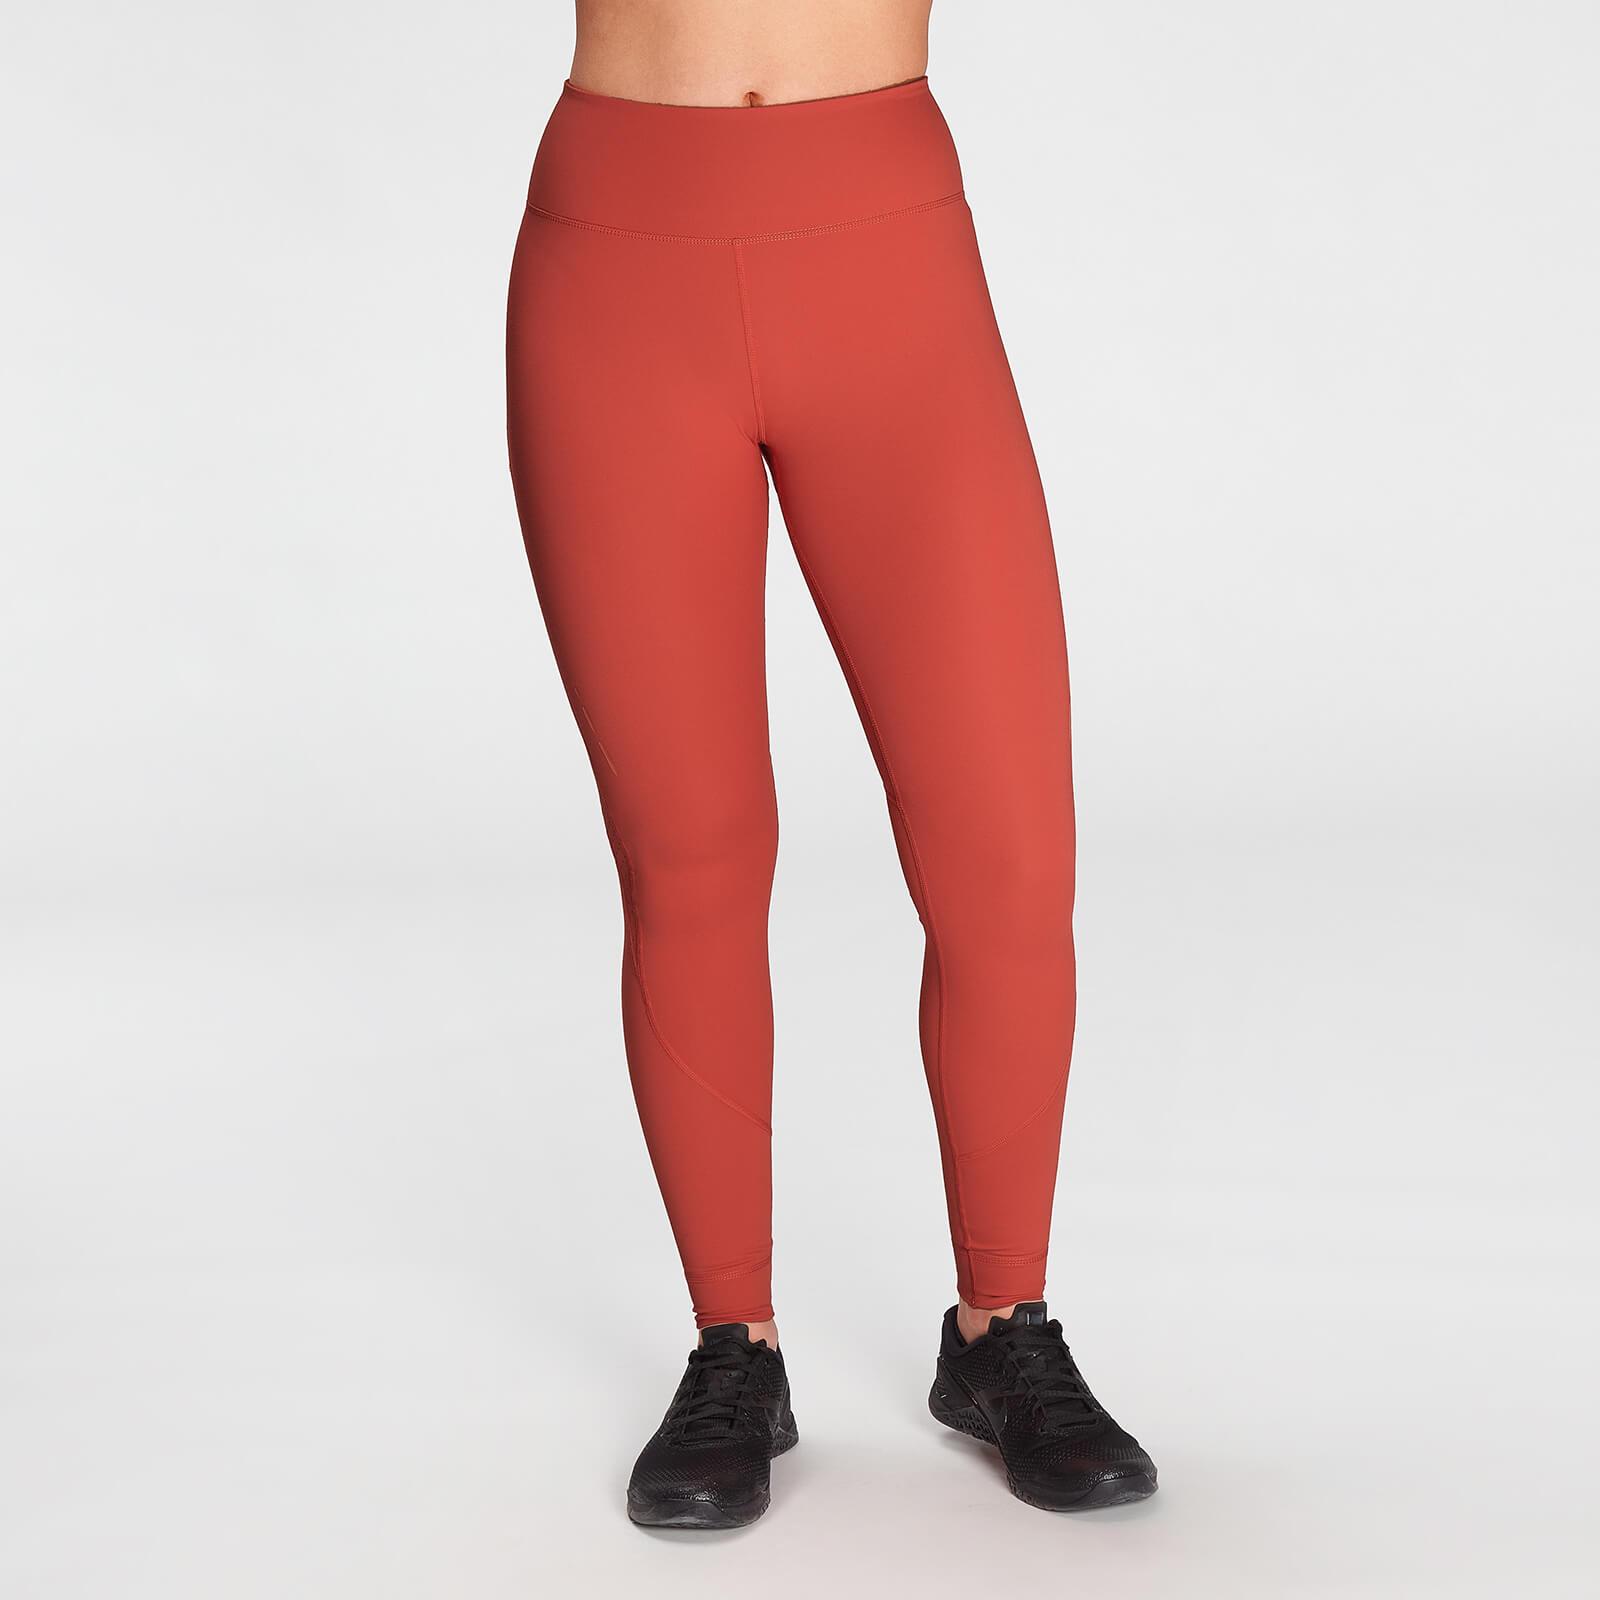 Купить MP Women's Power Ultra Leggings- Warm Red - XS, Myprotein International